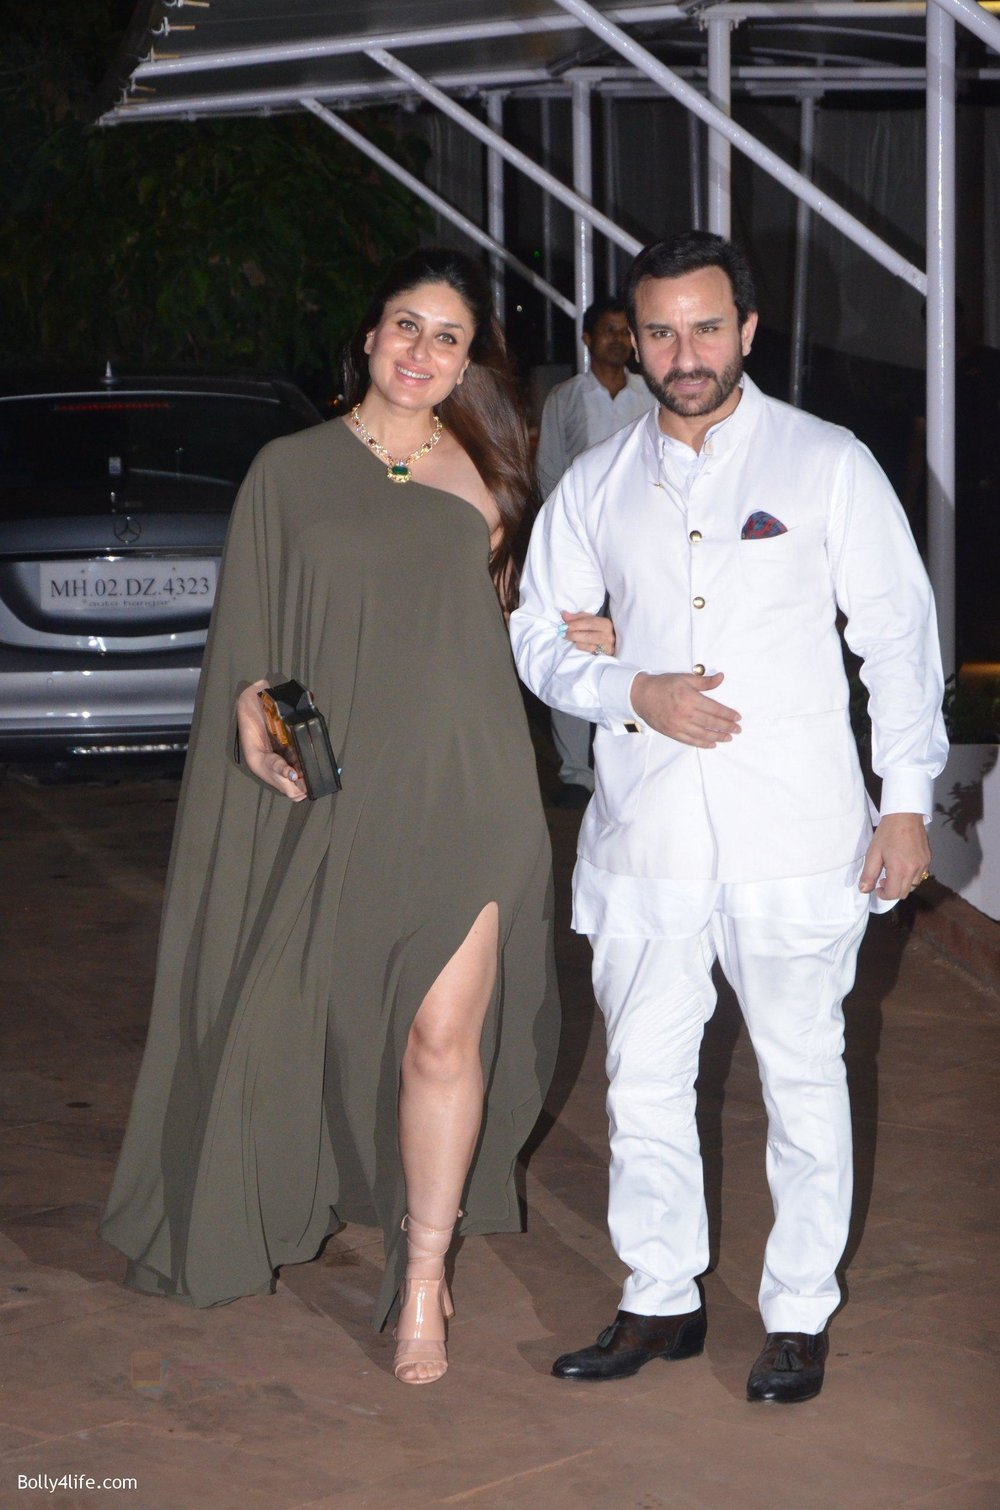 Saif-Ali-Khan-Kareena-Kapoor-at-Reema-jain-bday-party-in-Amadeus-NCPA-on-28th-Sept-2016-871.jpg